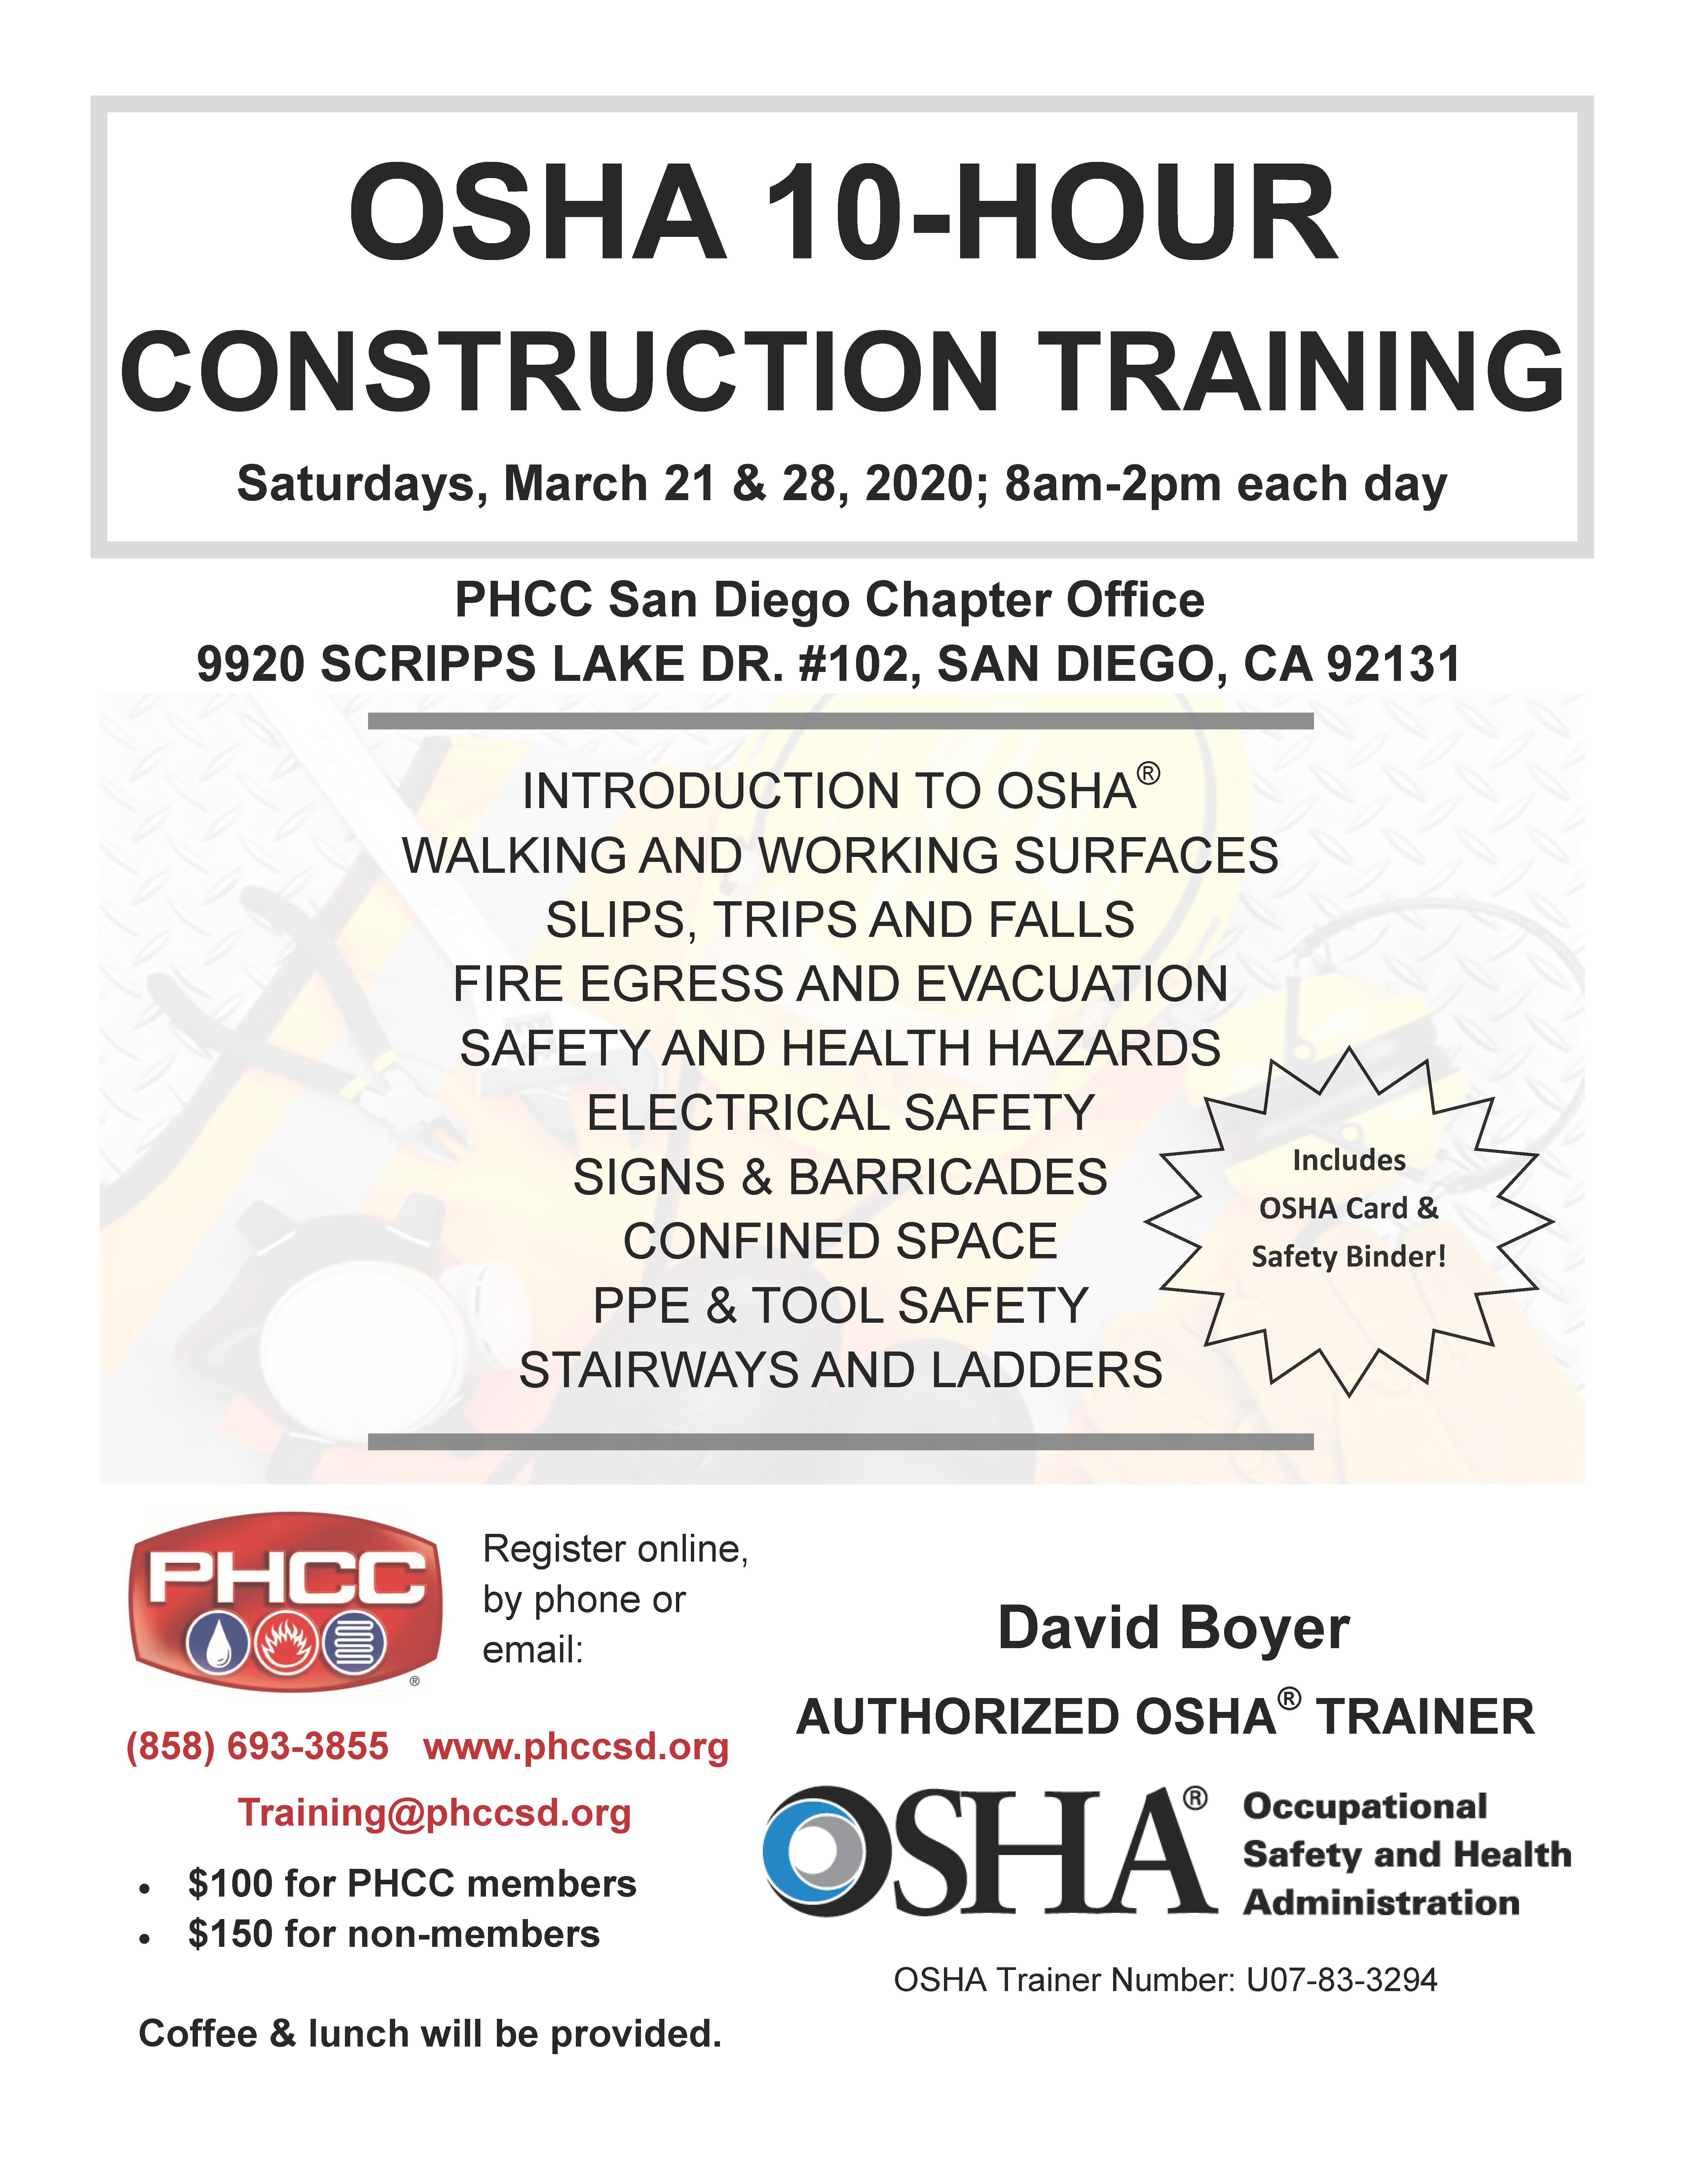 OSHA 10-Hour Construction Training at the PHCC Academy of San Diego